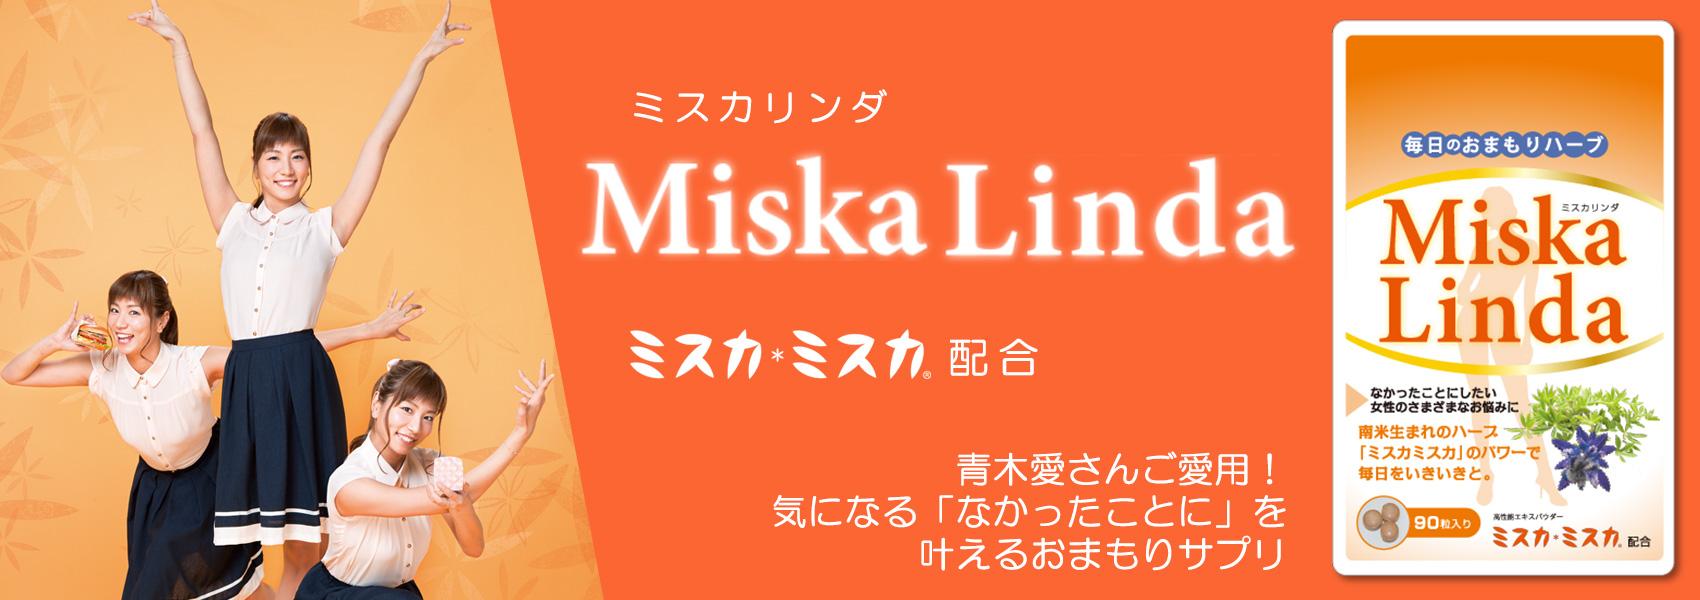 「MiskaLinda(ミスカリンダ)」は旅サラダなどテレビで活躍中の青木愛さんご愛用!腸内環境改善・便秘解消で食べ過ぎ紫外線・乾燥による肌荒れを「なかったことに」を叶えるおまもりサプリ